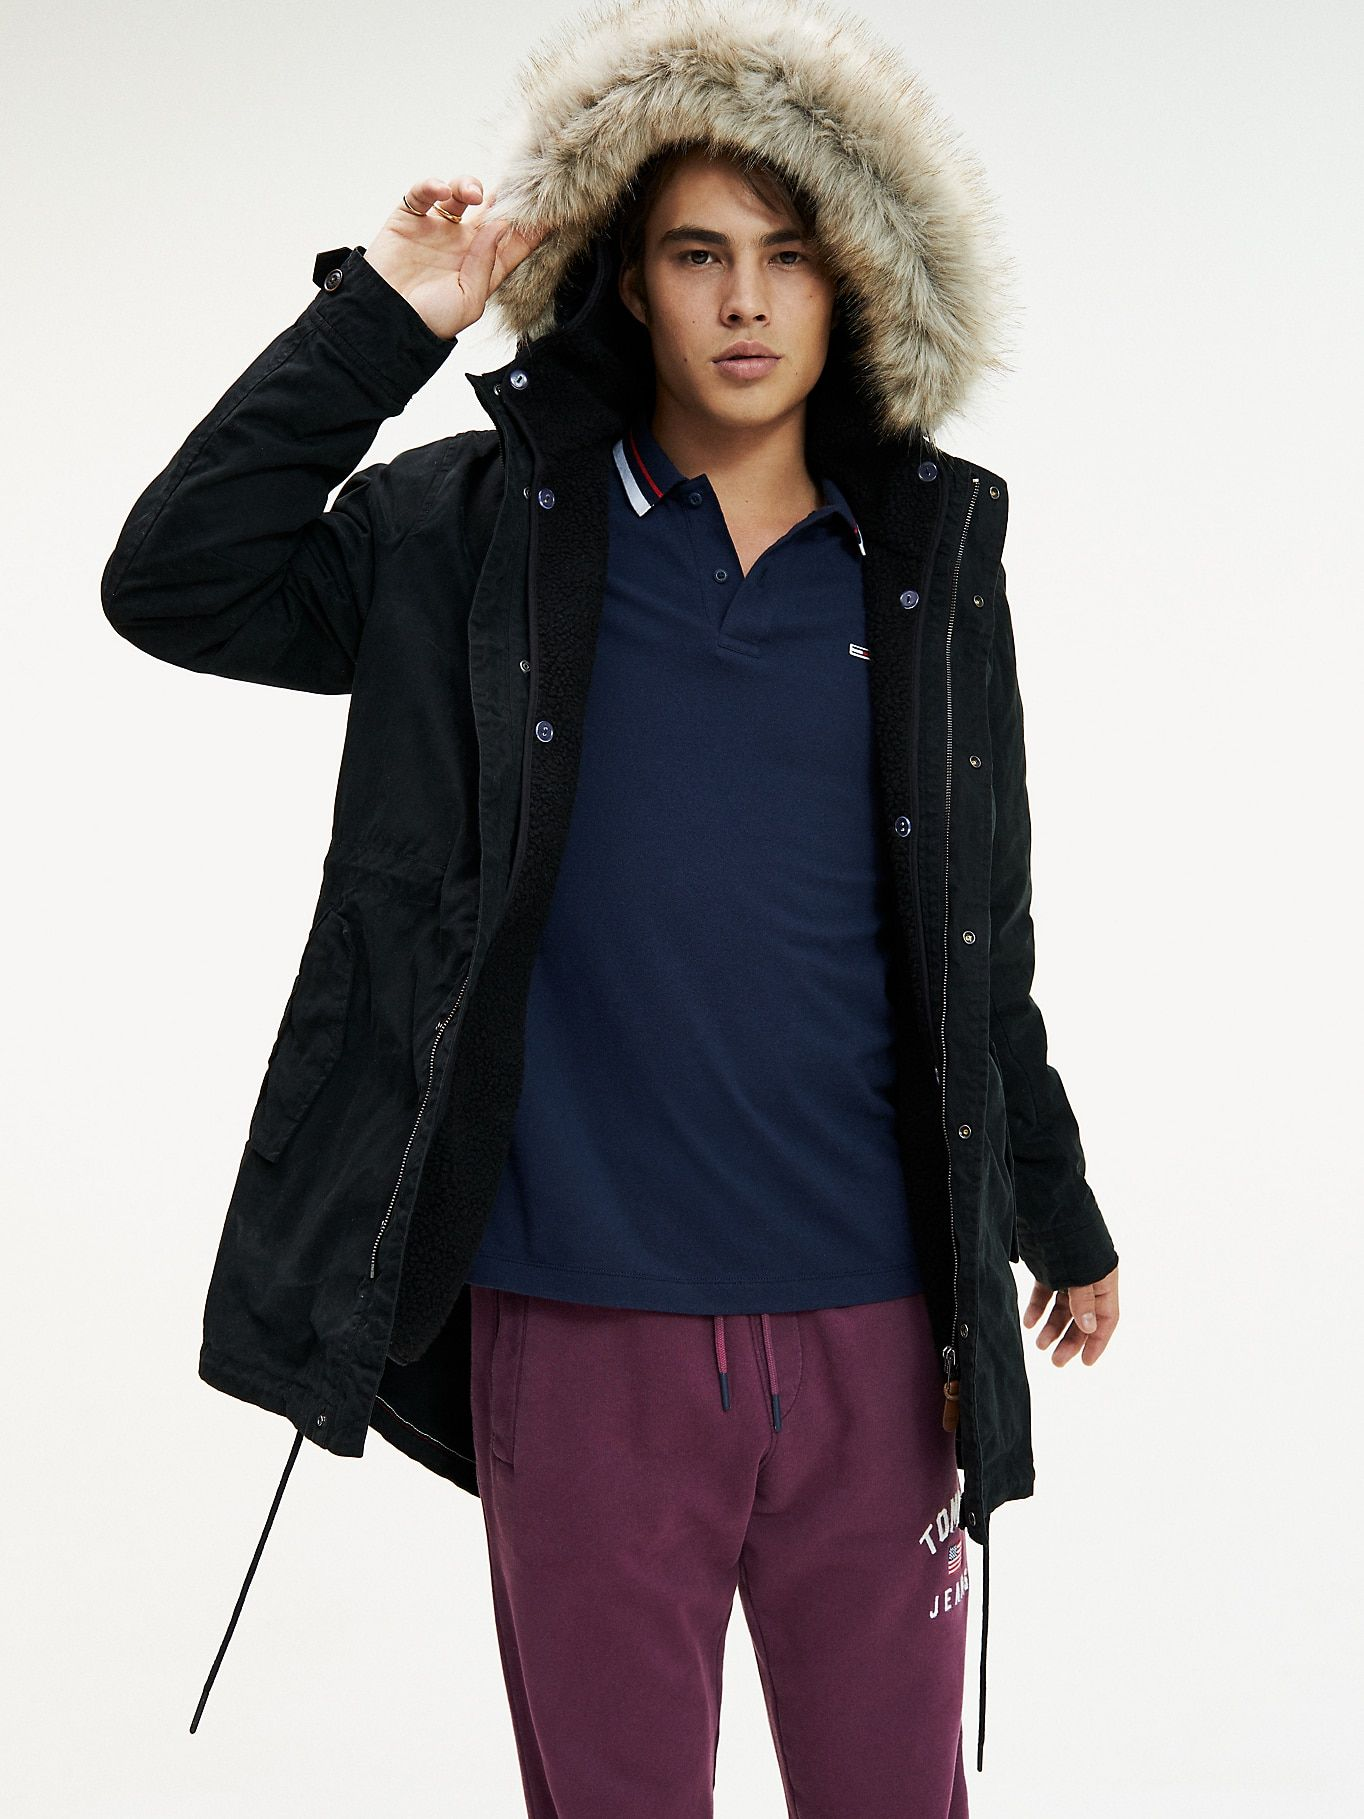 Cotton Fleece Lined Parka Tommy Black Tommy Hilfiger Outerwear Jackets Men S Coats Jackets Tommy Hilfiger [ 1819 x 1364 Pixel ]